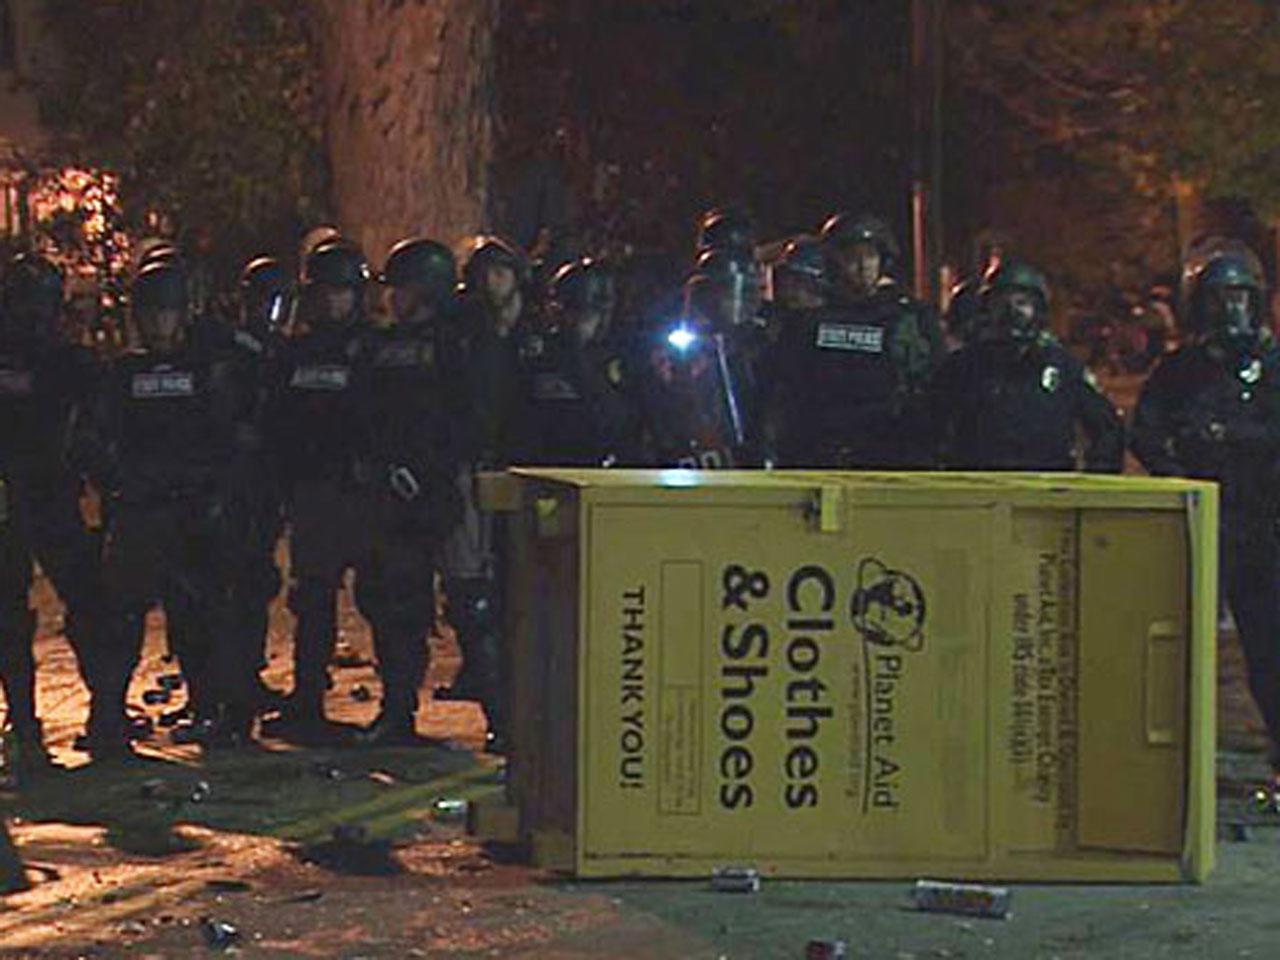 New Hampshire pumpkin fest riot prompts police investigation